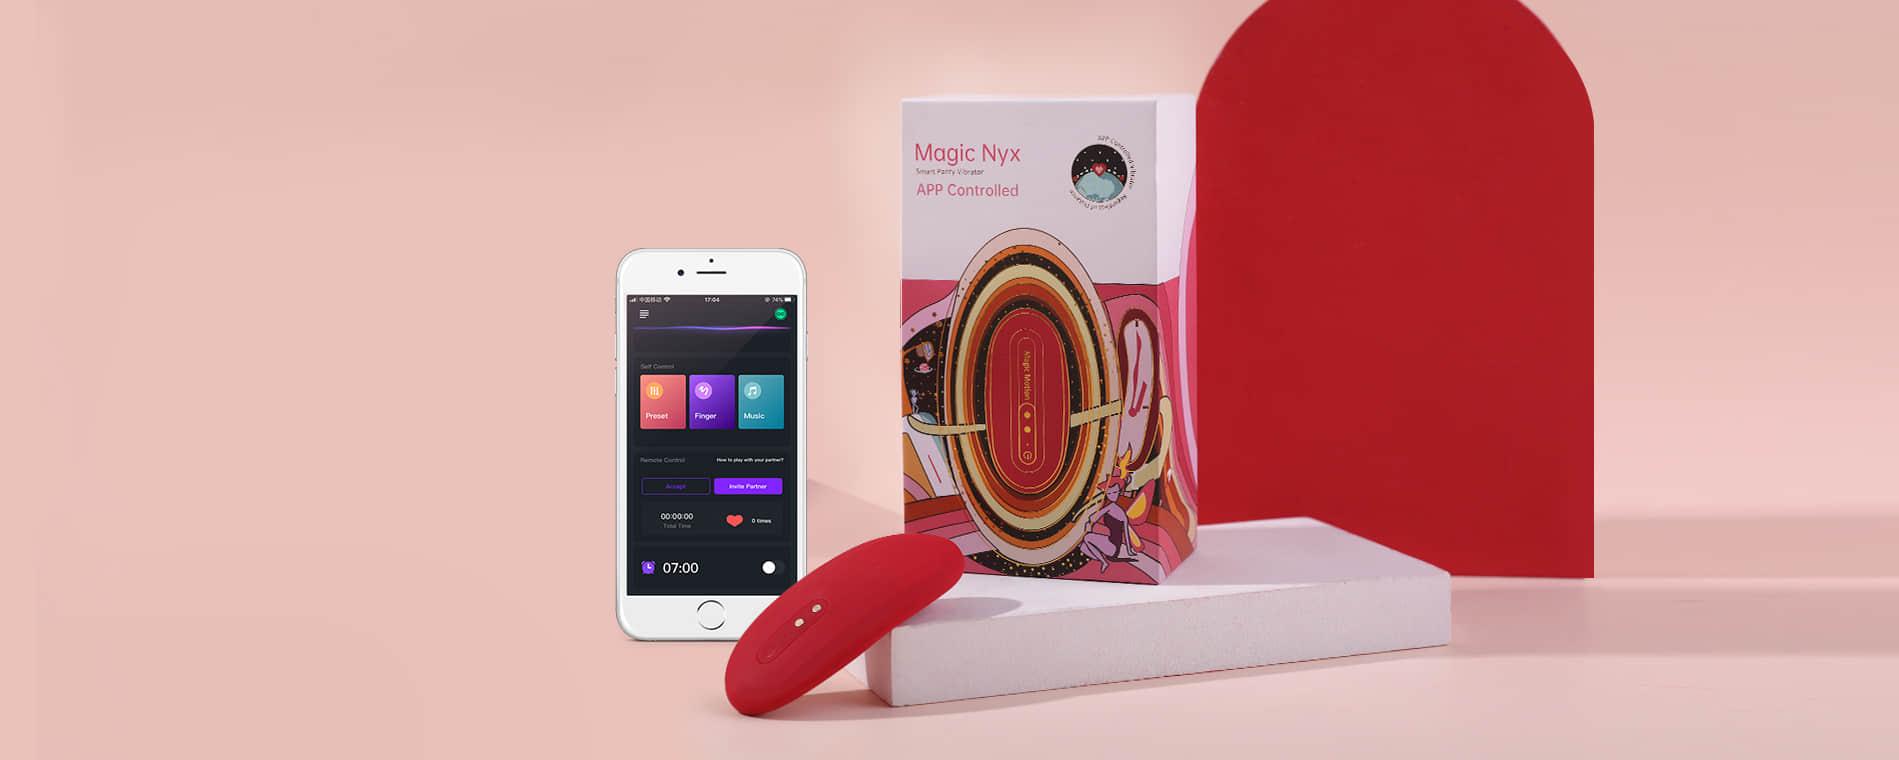 Magic NYX Magic Motion, panty vibrador reloj despertador y larga distancia bluetooth / APP